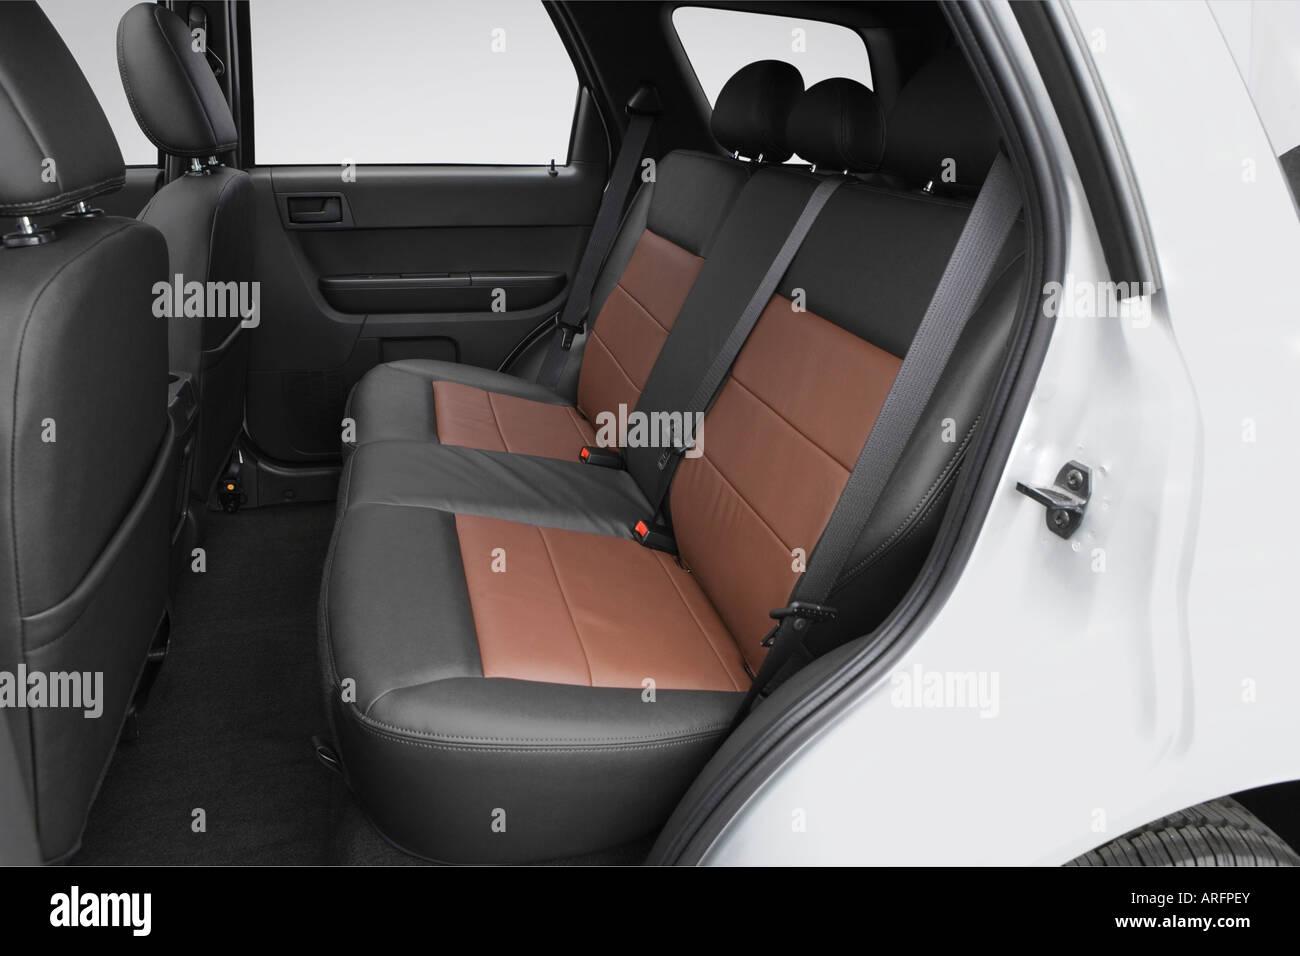 SMD1136 FRONT Semi-Metallic Brake Pads Fits 03-06 Dodge Sprinter 2500